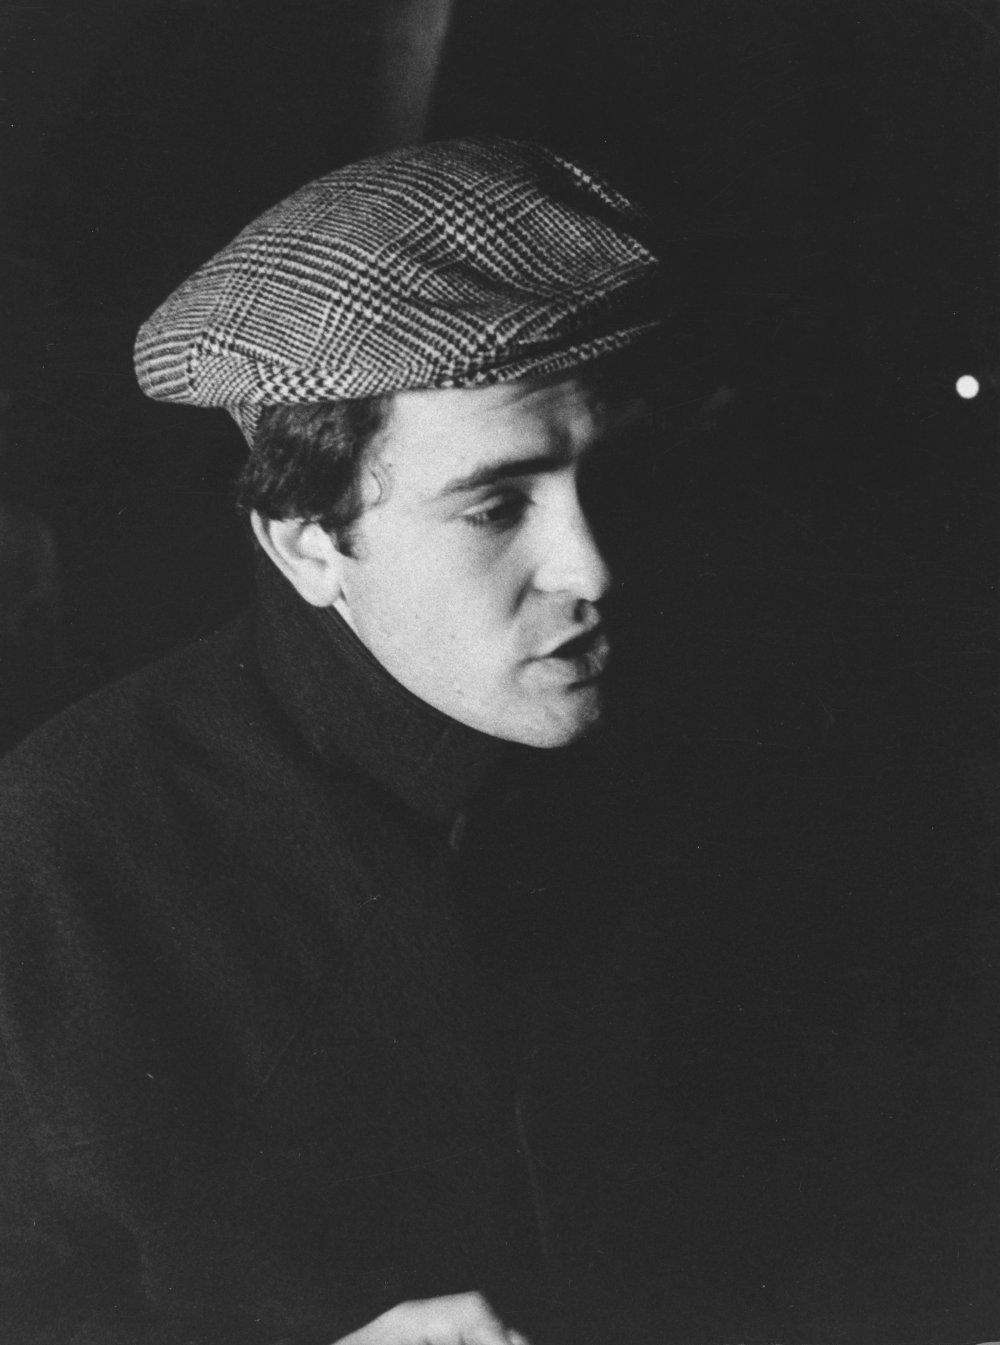 A young Bernardo Bertolucci